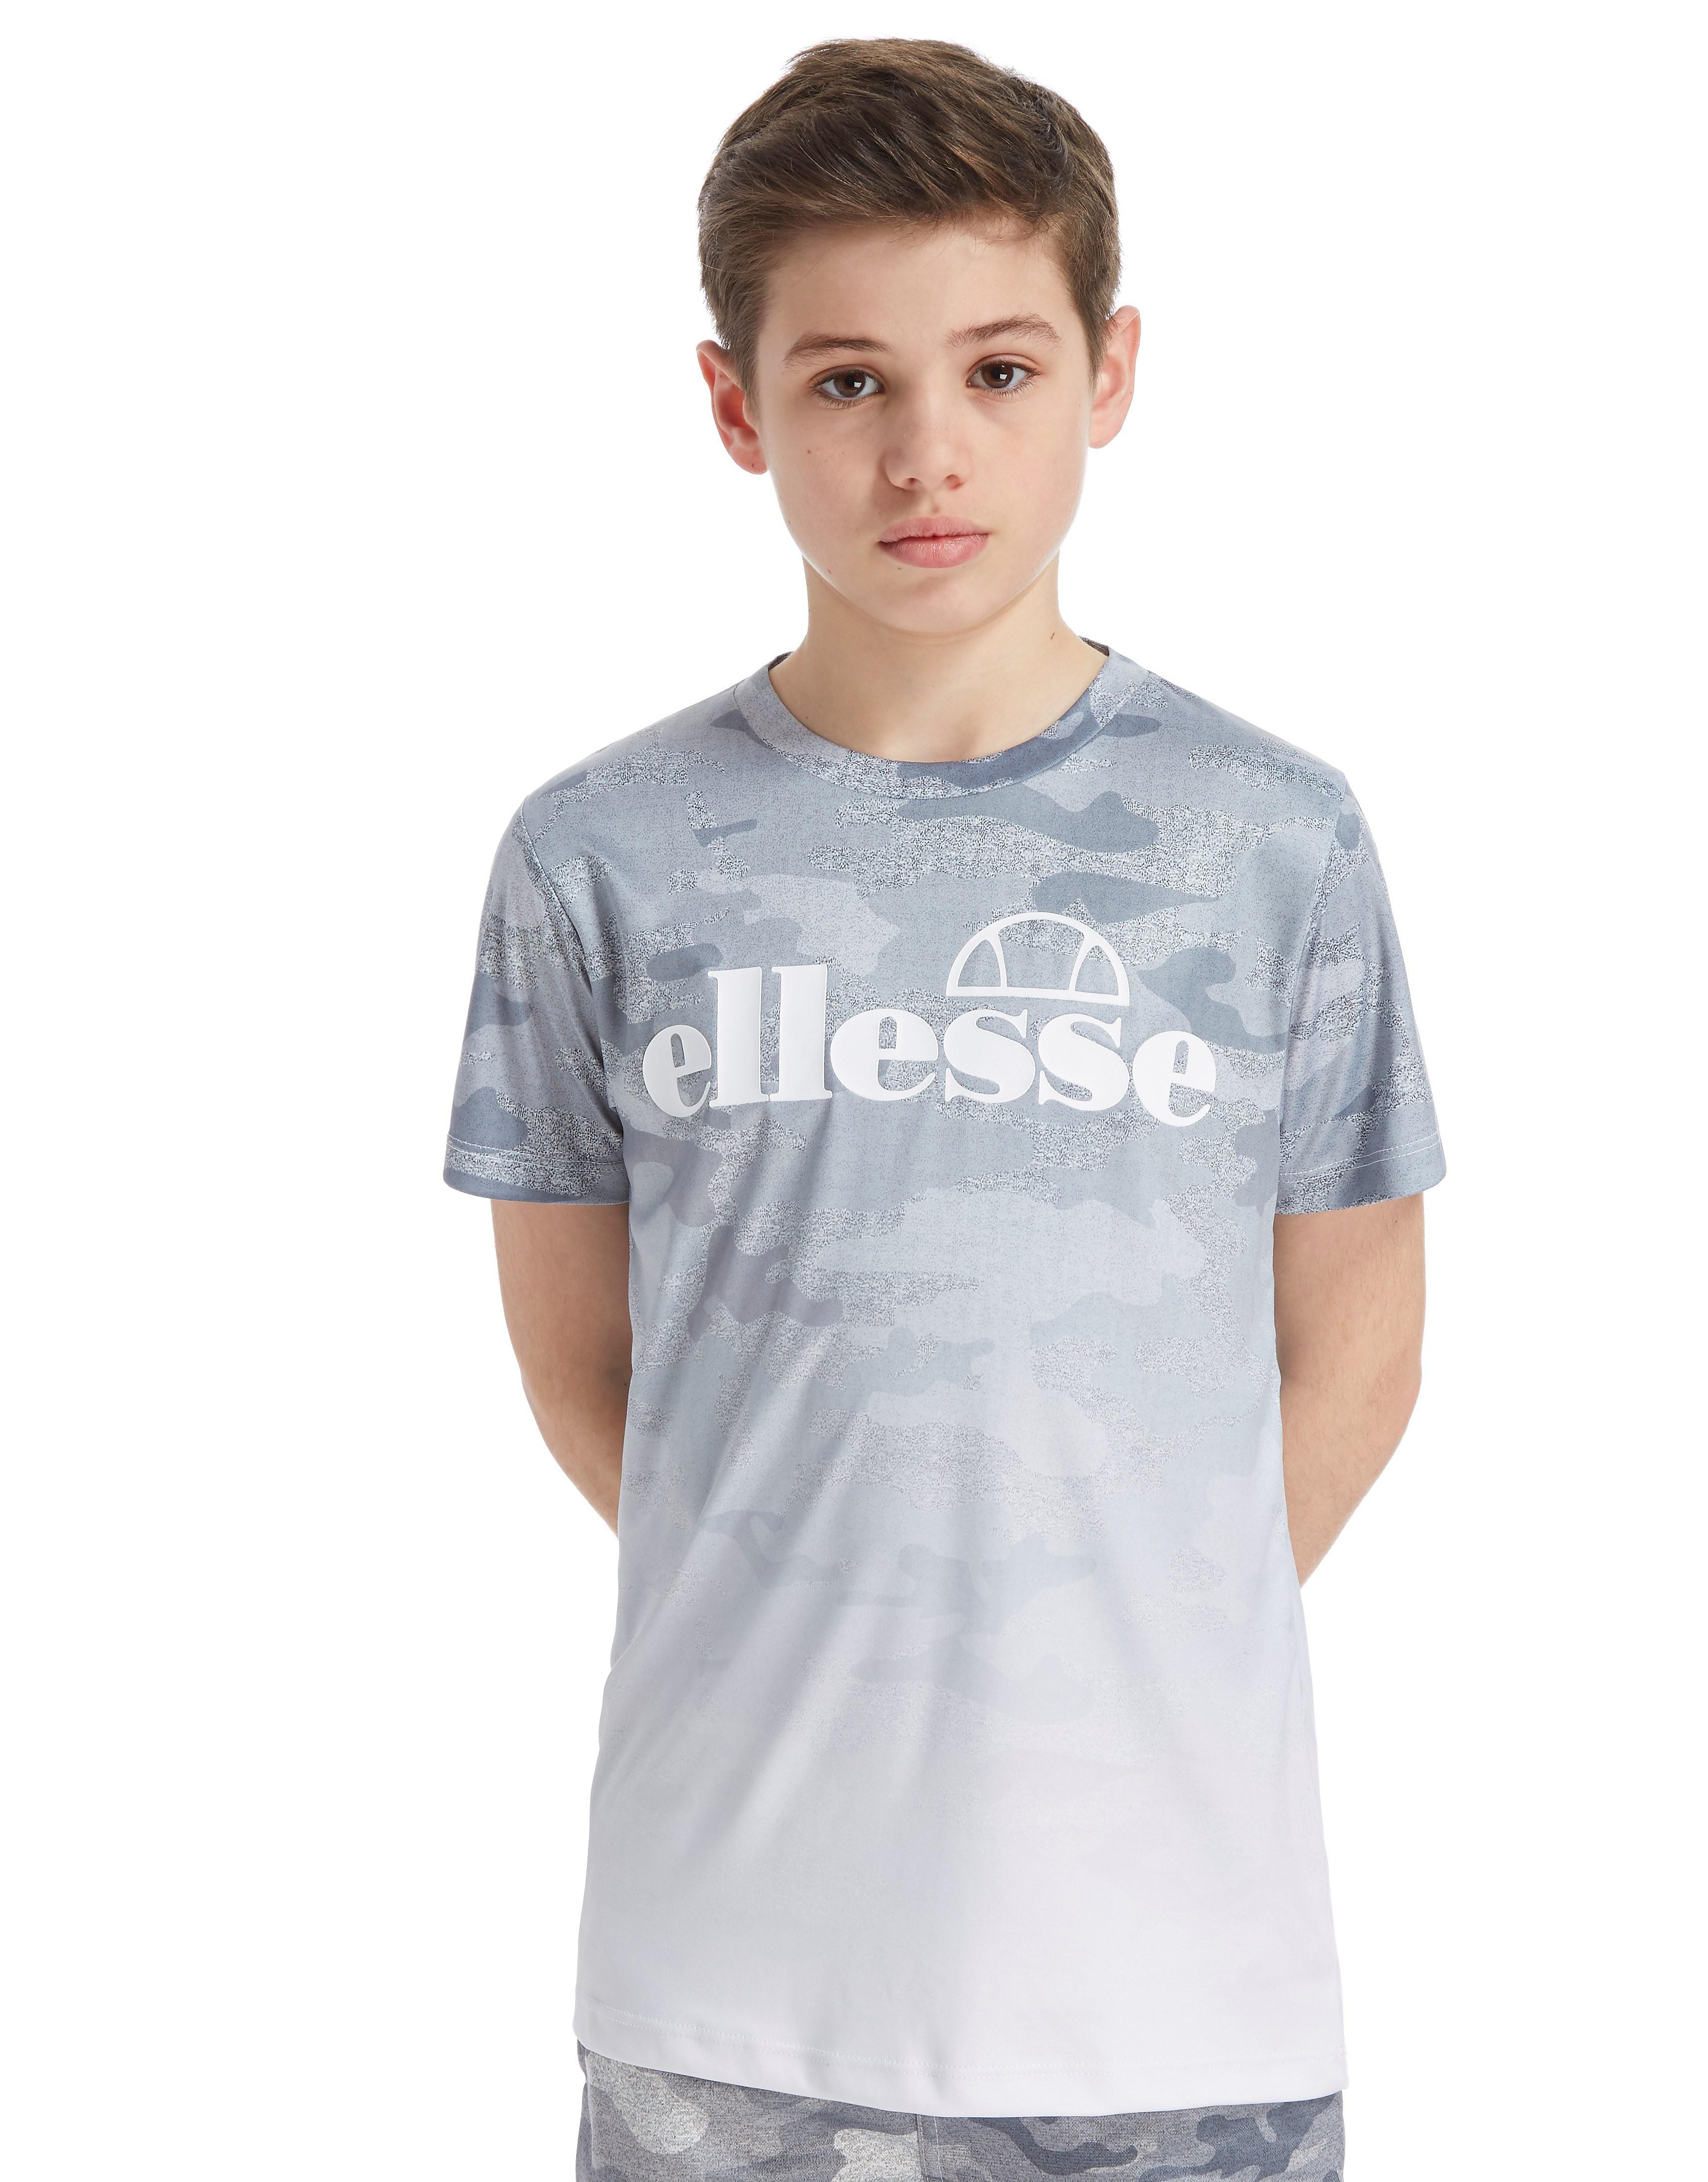 Ellesse Bove Fade T-Shirt Junior